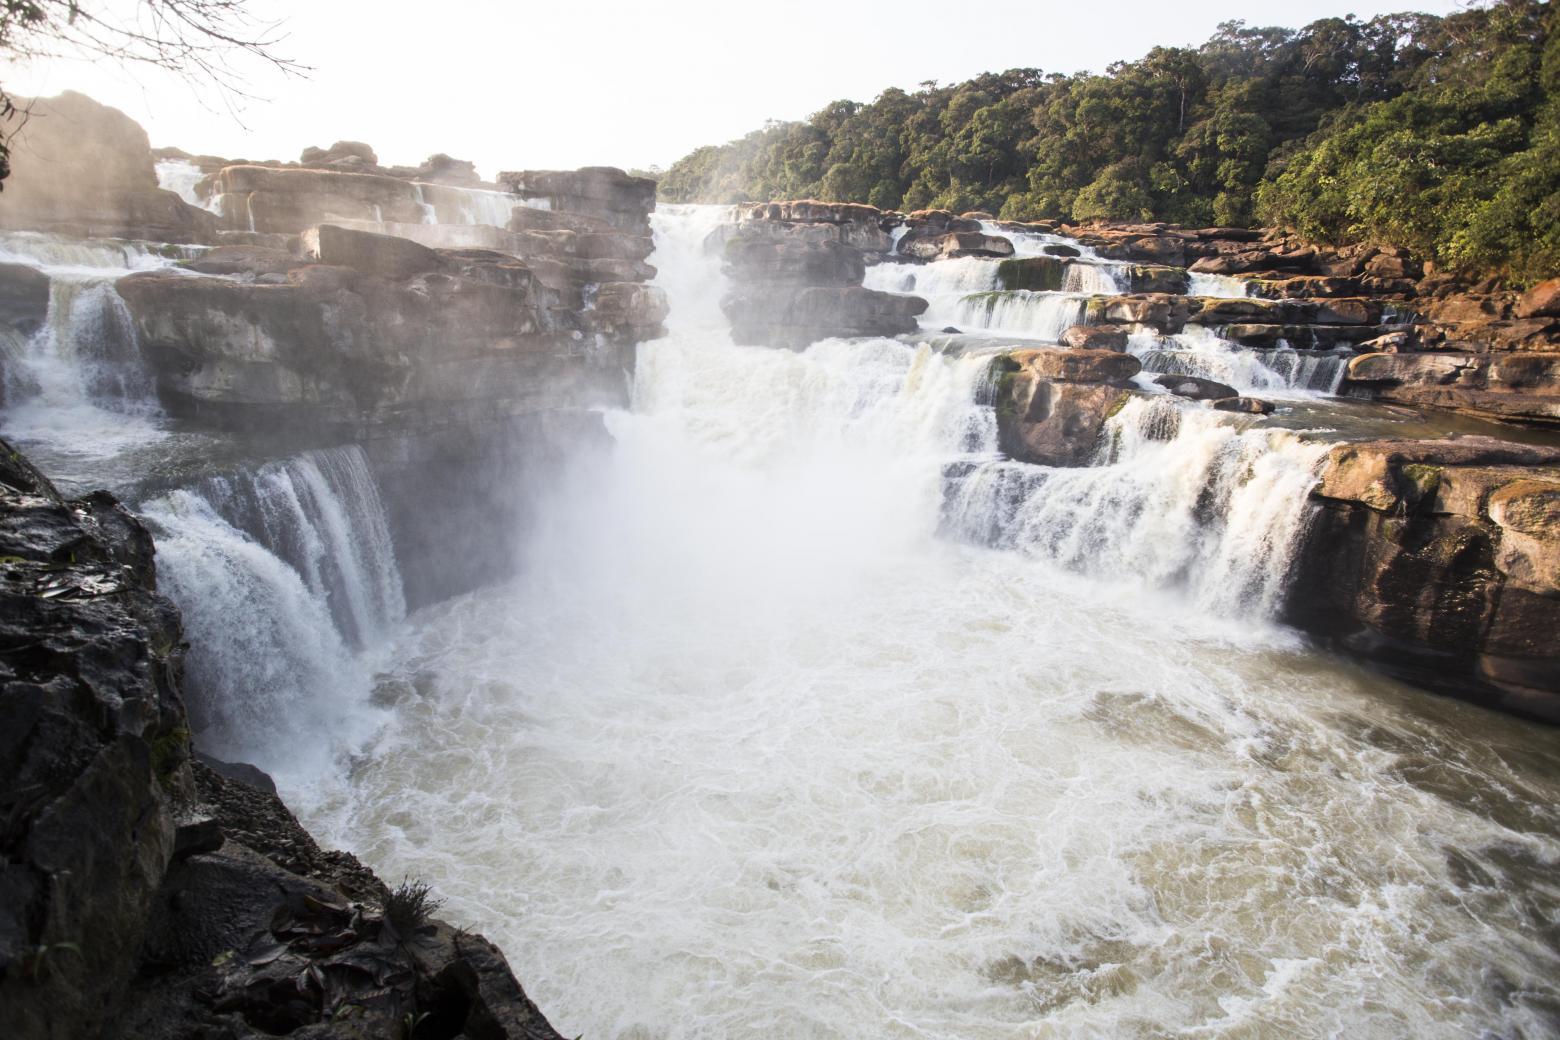 El Parque Nacional Natural Yaigojé Apaporis. Foto: panorama.solutions/